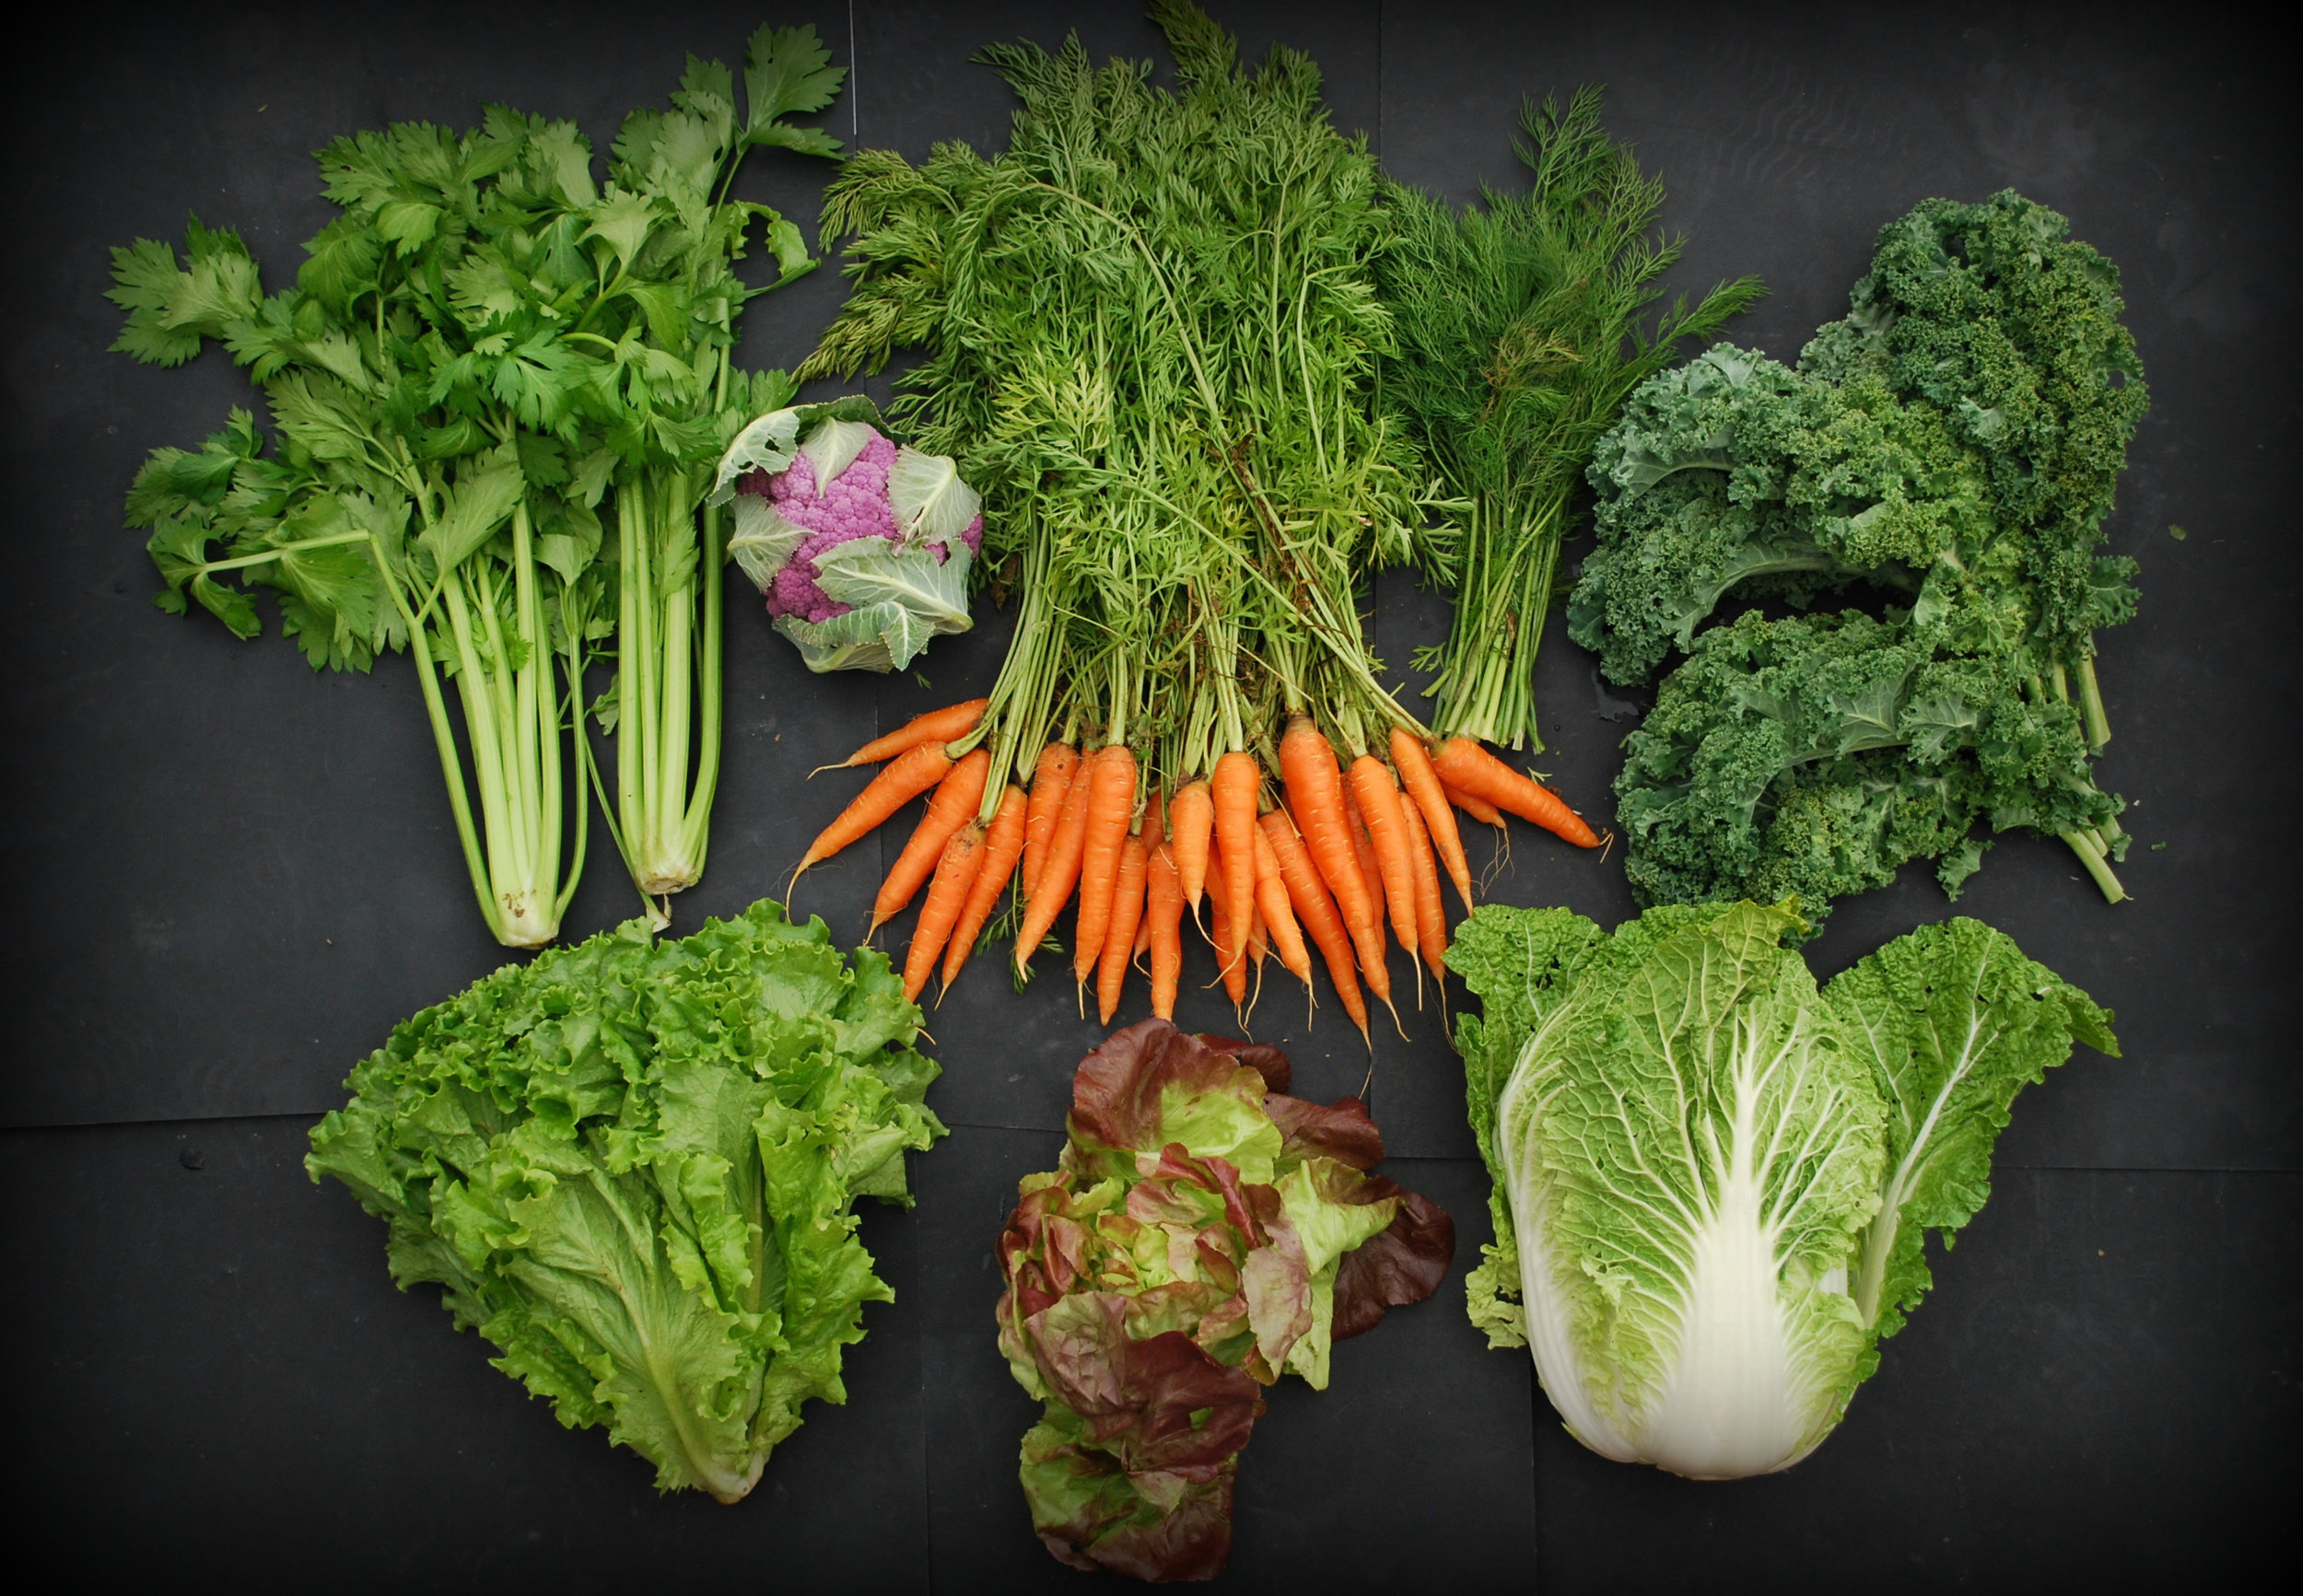 Your Week 9 share: celery, Romaine lettuce, red Butterhead lettuce, Napa cabbage, curly kale, dill, carrots, purple cauliflower.